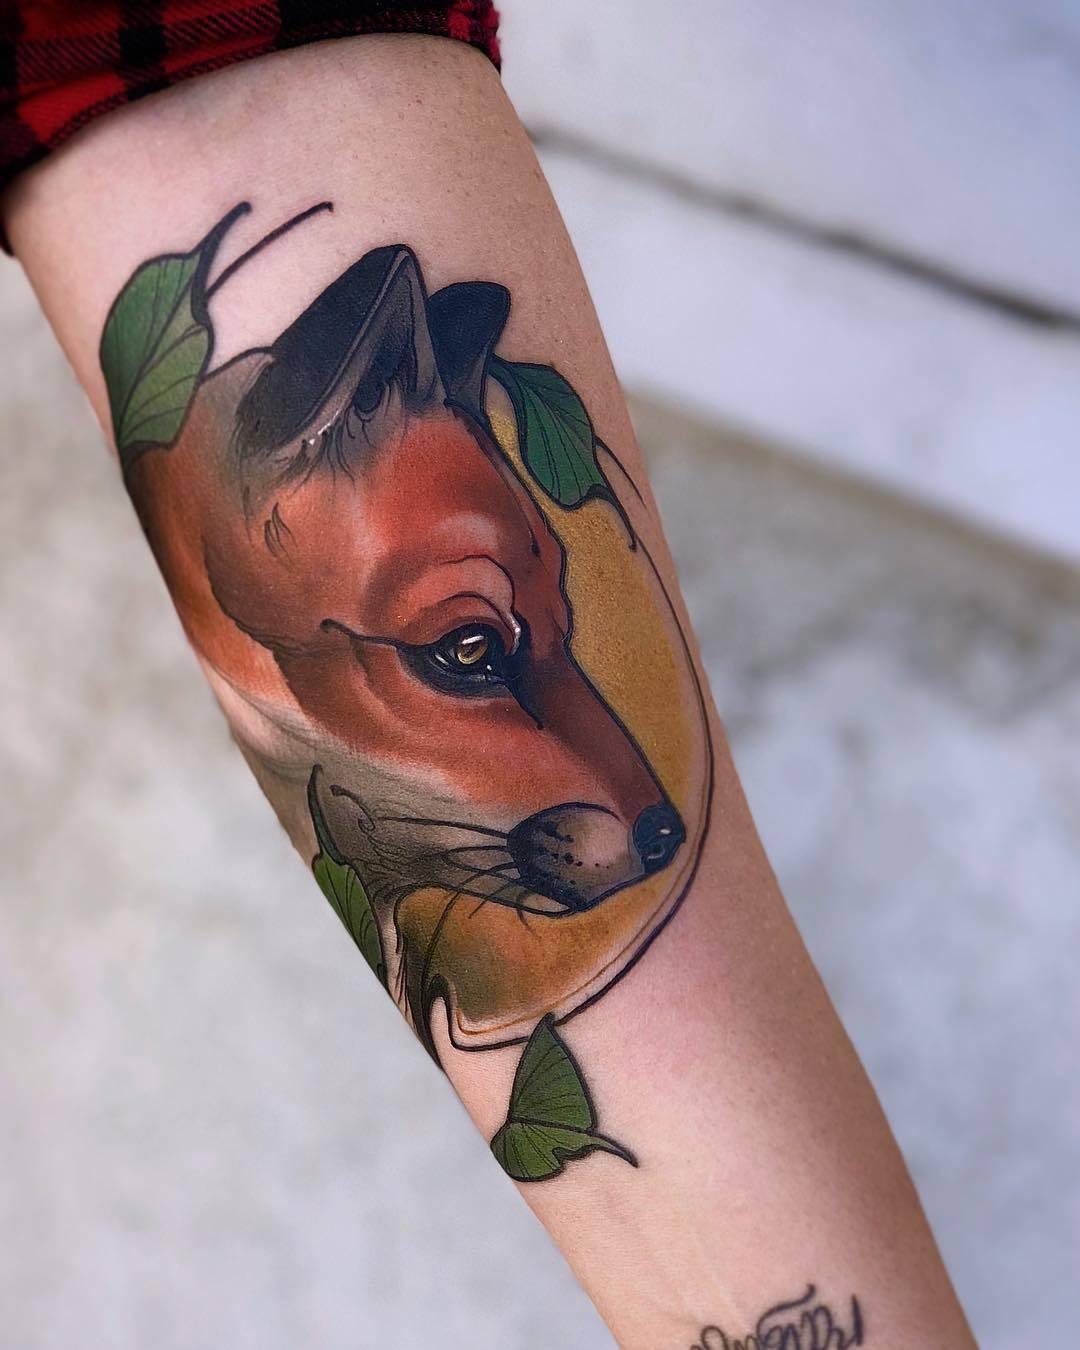 Color Tattoo By Matt From Black Sails Tattoo: Tattoo Artist Matt Tischler